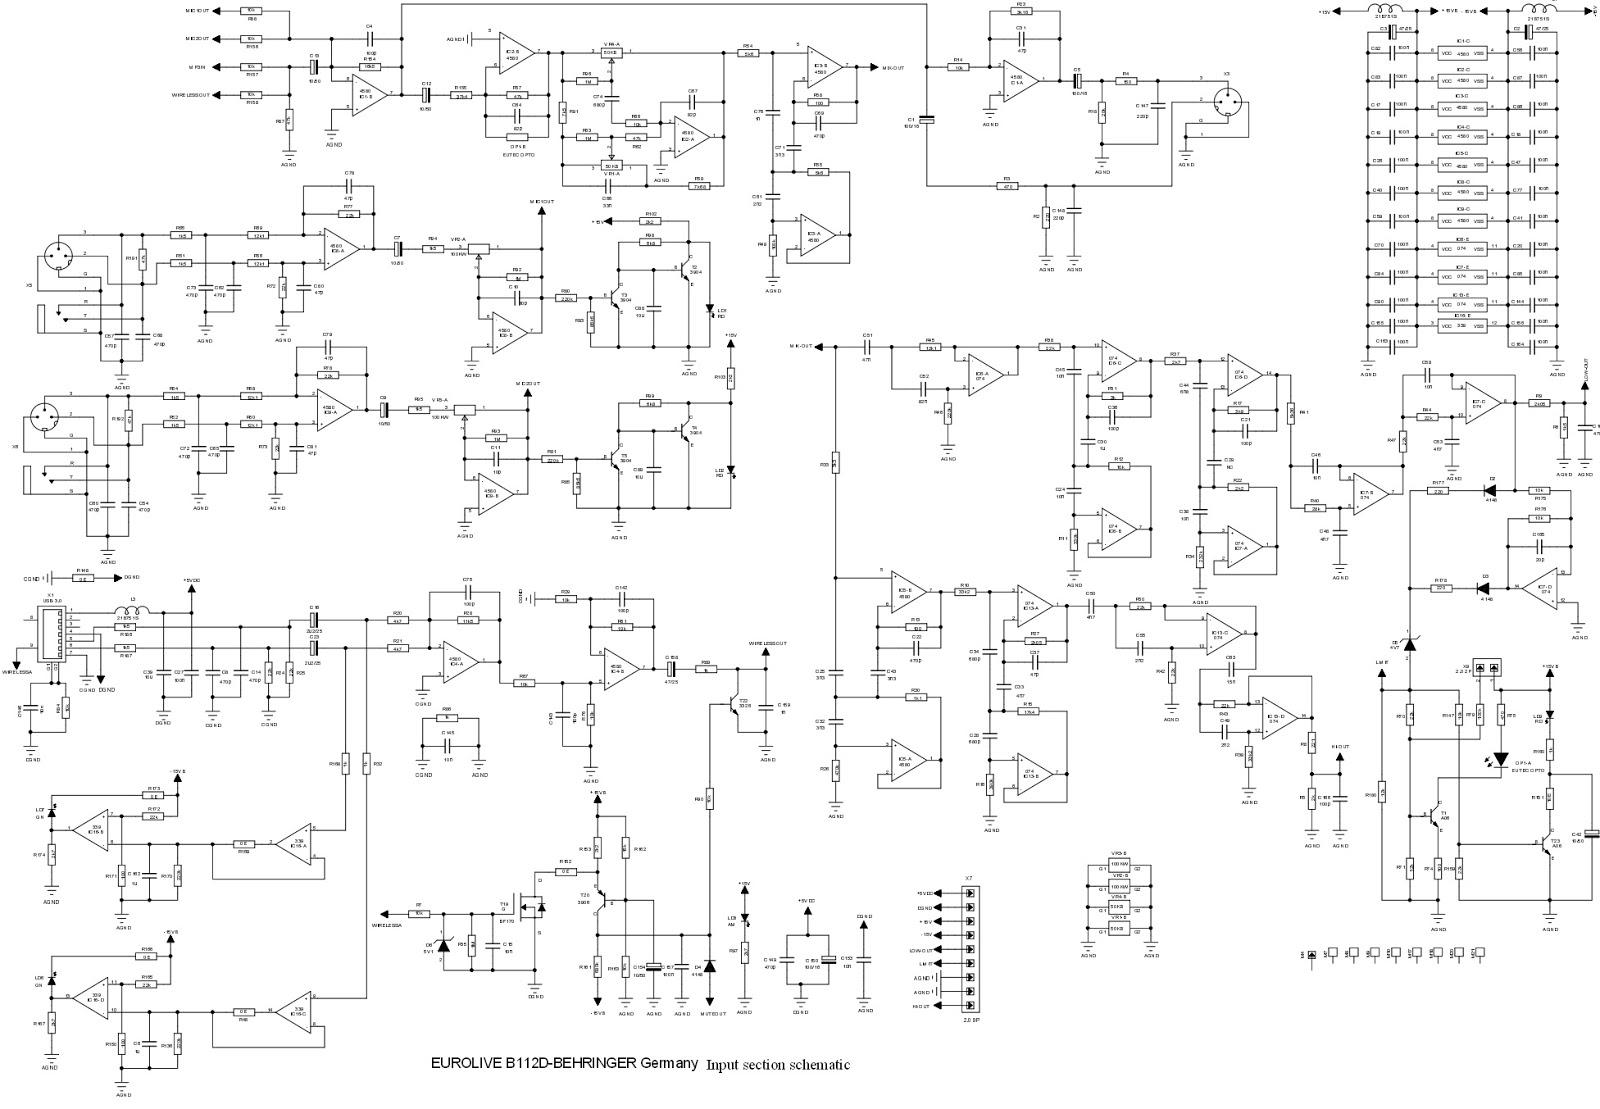 medium resolution of behringer pa system wiring diagram pa system setup diagram pa pa eurolive b112d behringer germany